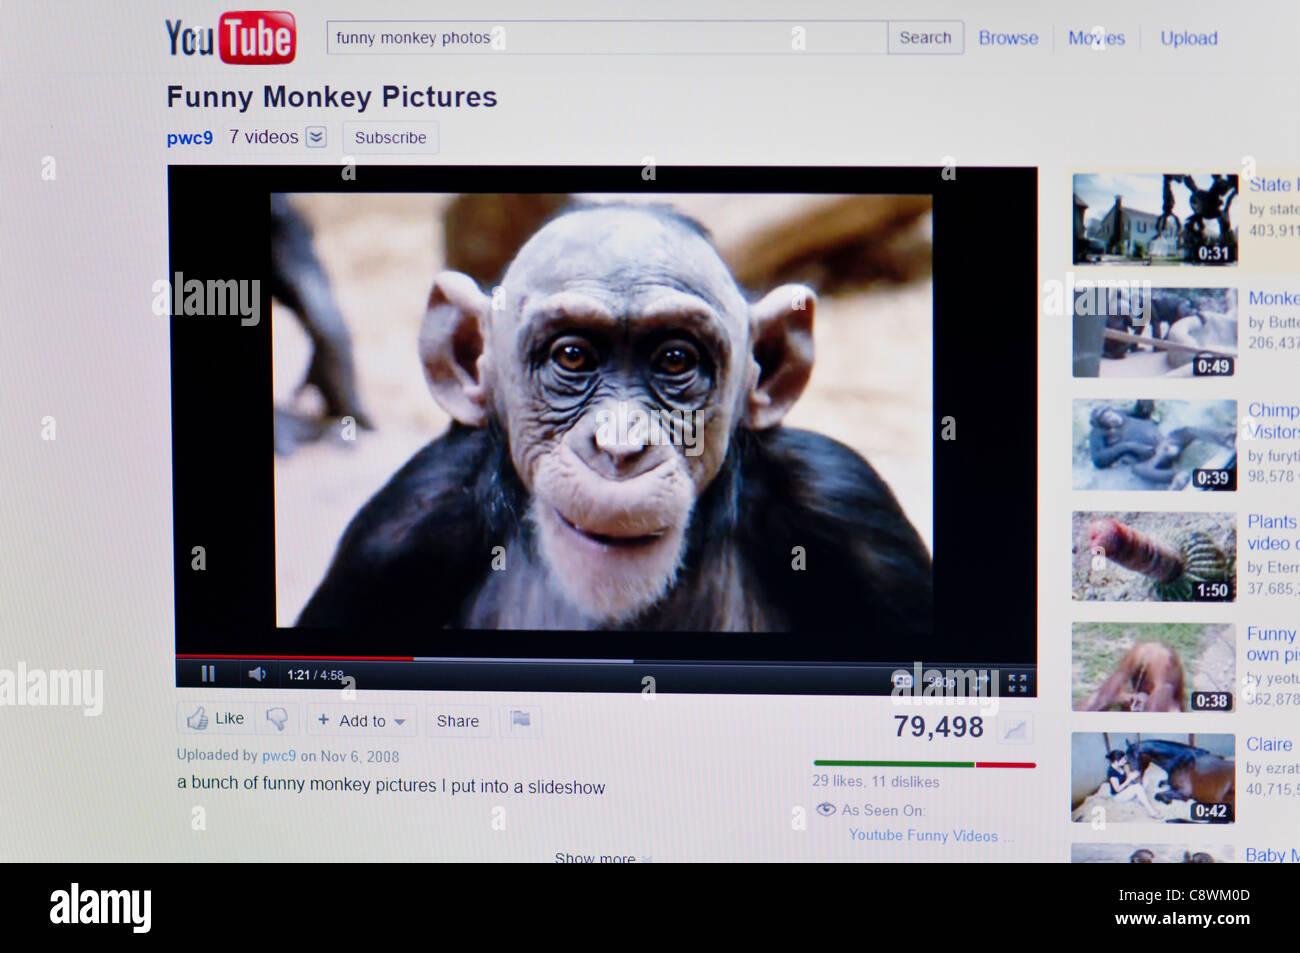 Image of: Animals Youtubecom Funny Video Screenshot Blazepress Youtubecom Funny Video Screenshot Stock Photo 39902477 Alamy